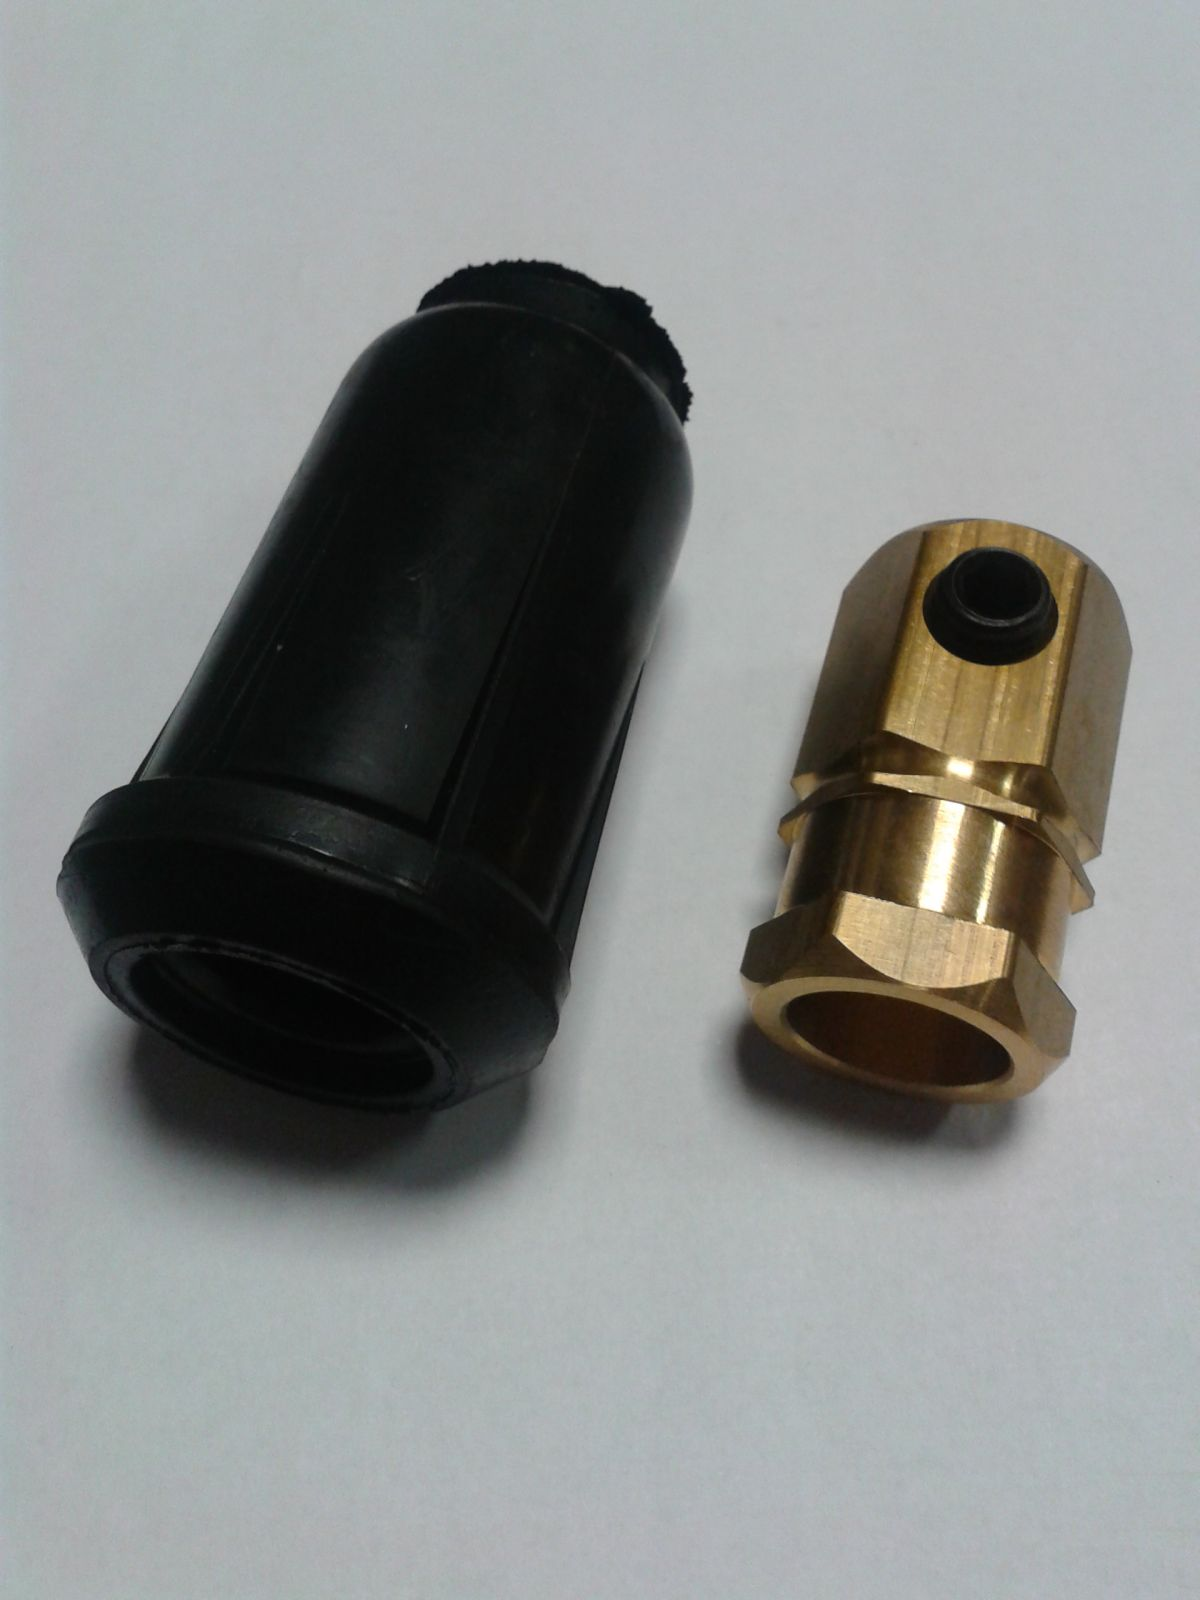 R400 samice - spojka kabelová